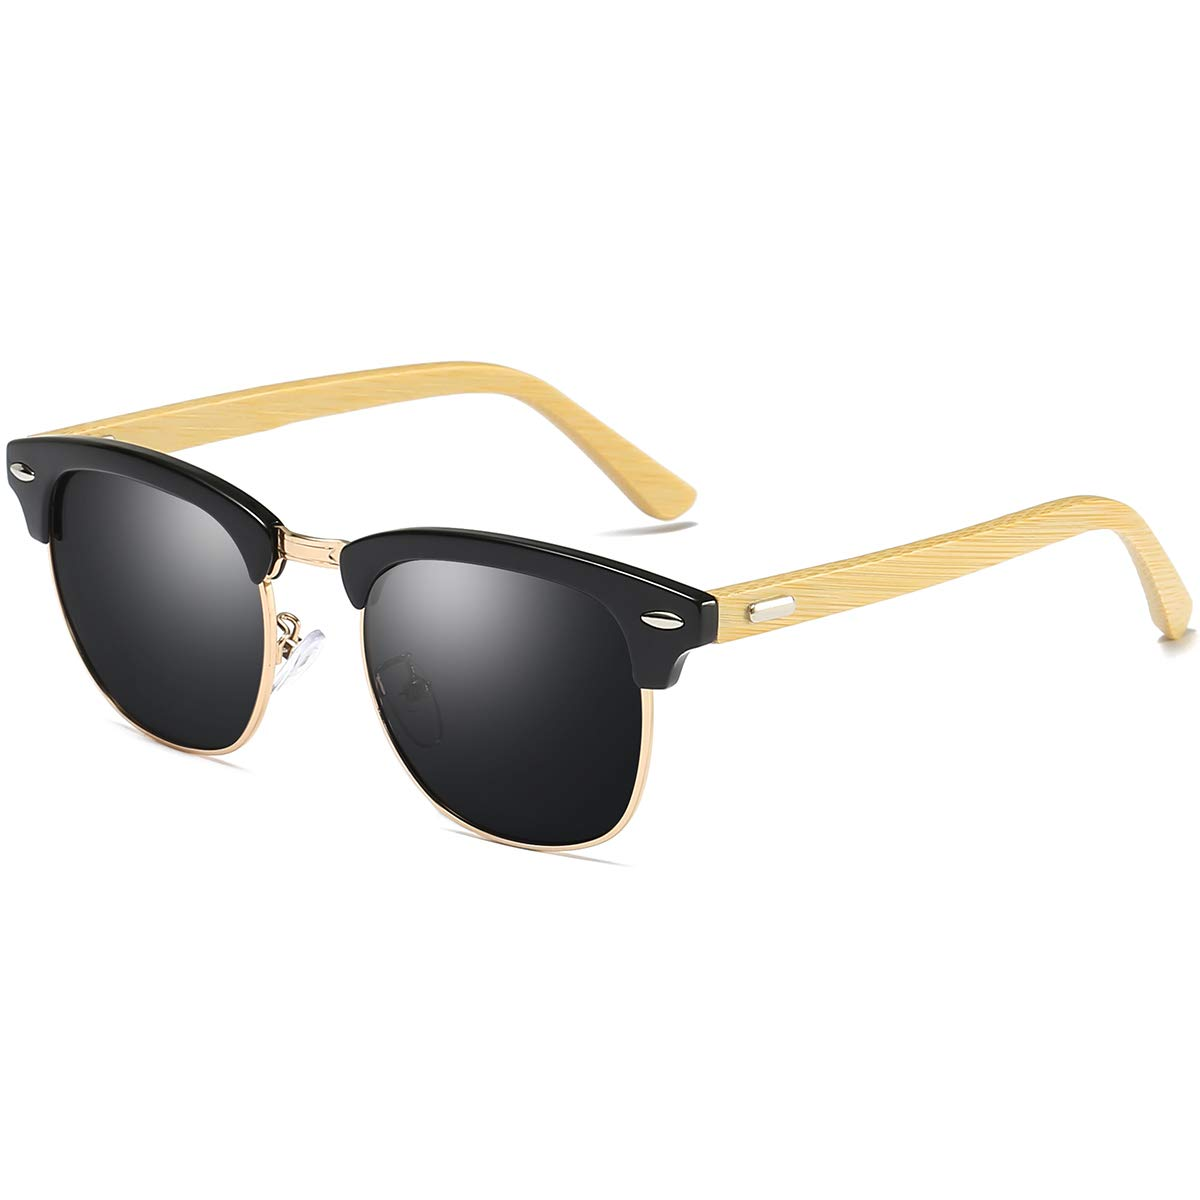 6e0b7b54963a1 Amazon.com  polarized bamboo frame clubmaster sunglasses for women  Men